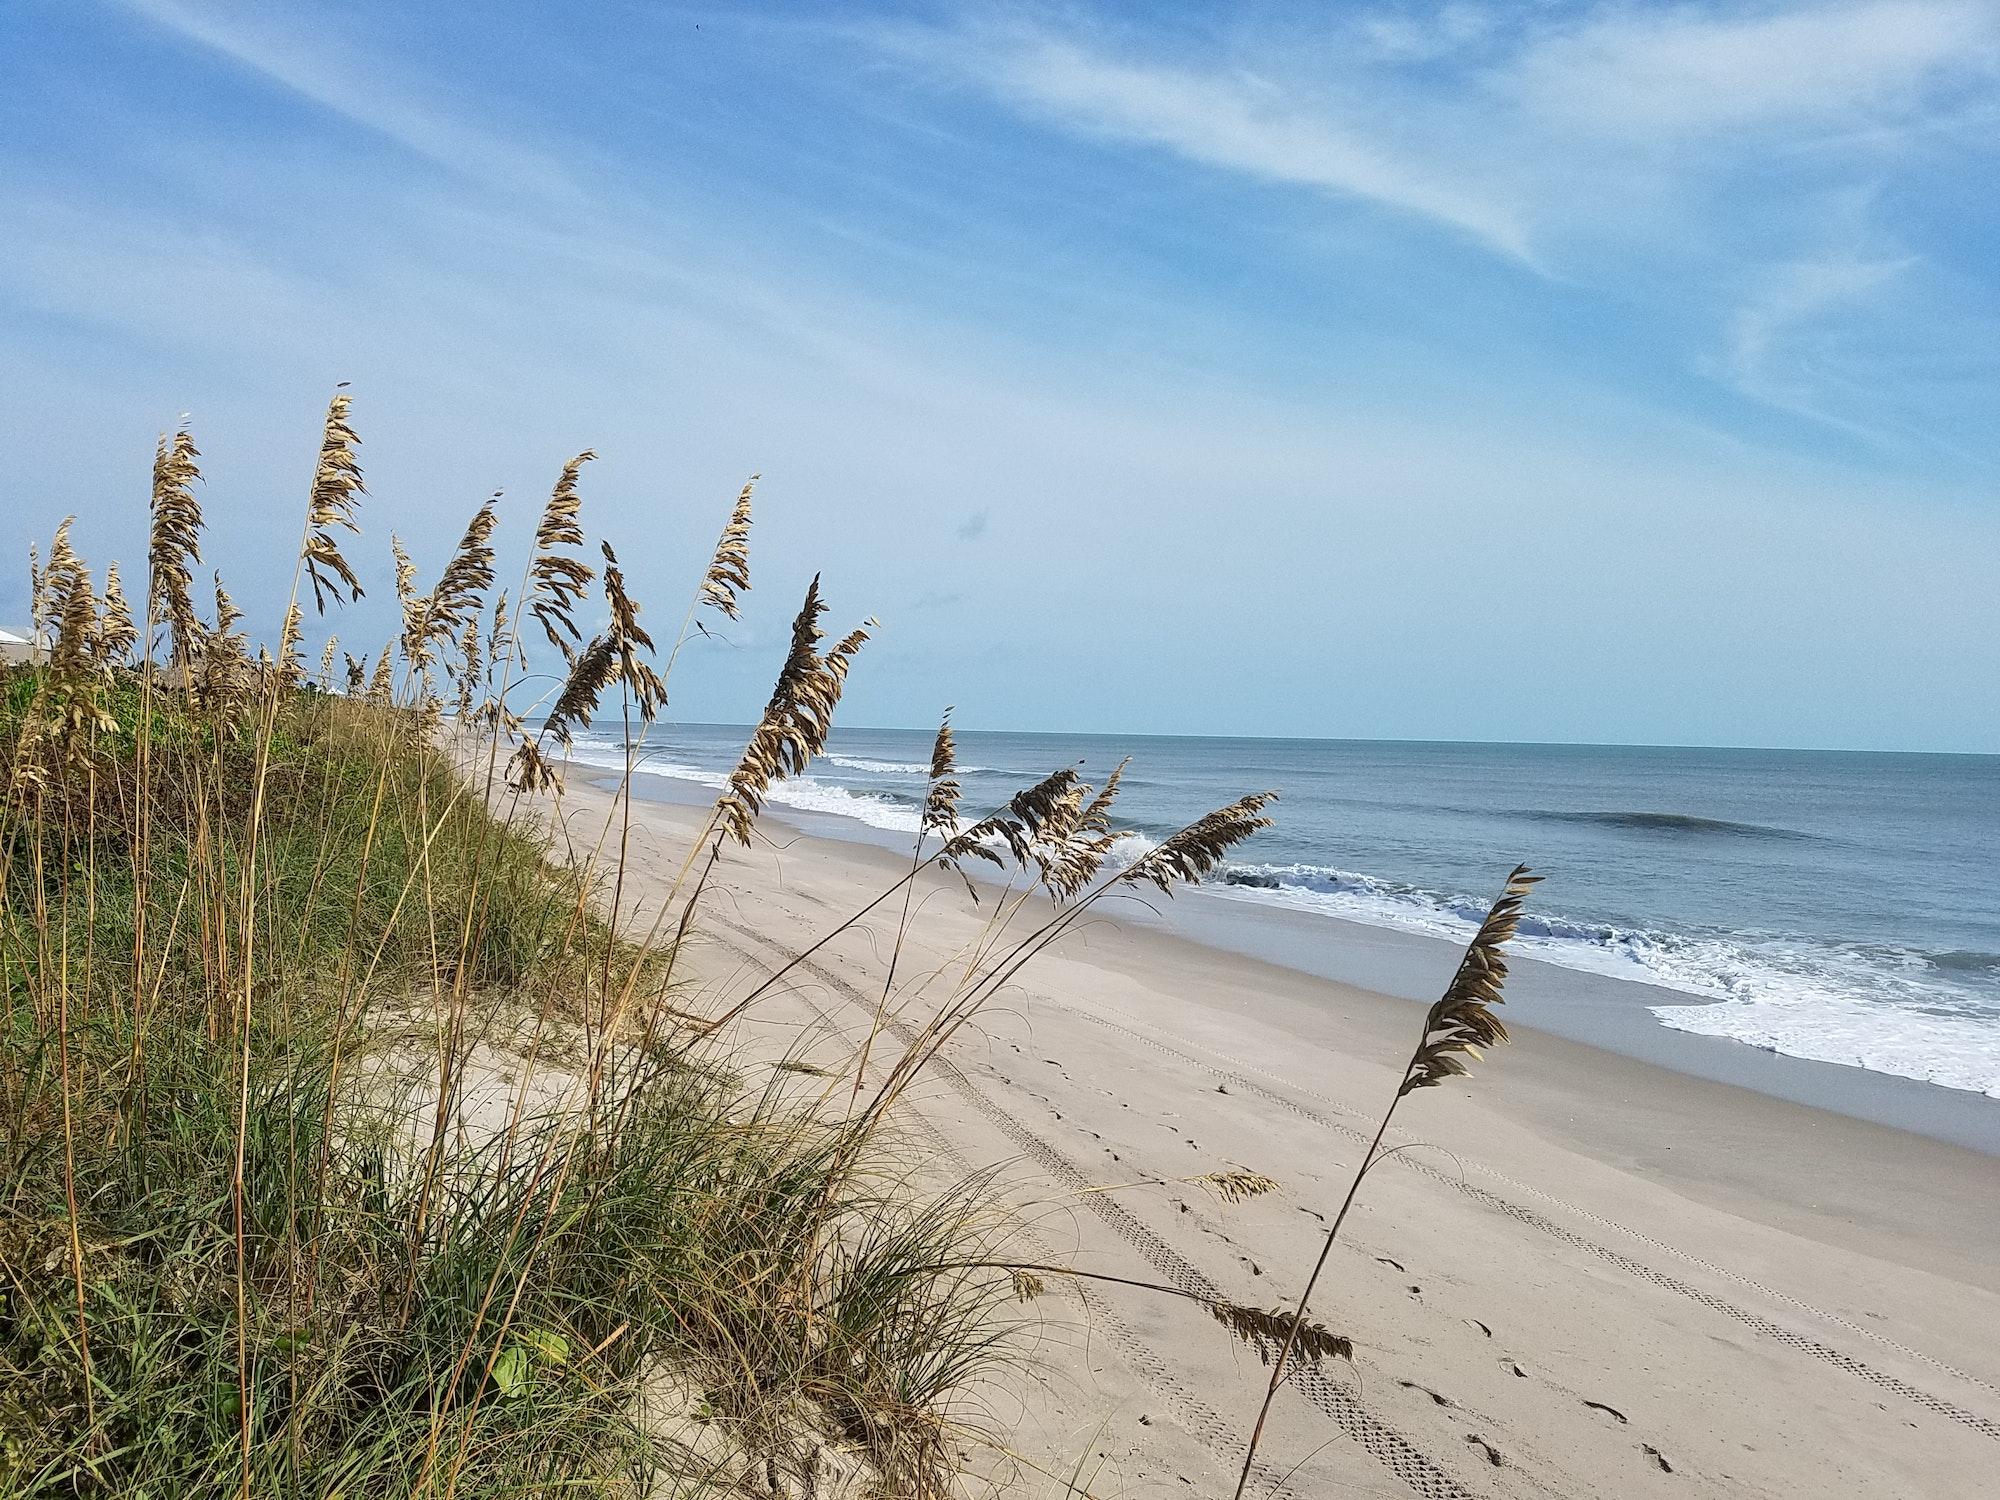 sea oats on the dune overlooking the beach